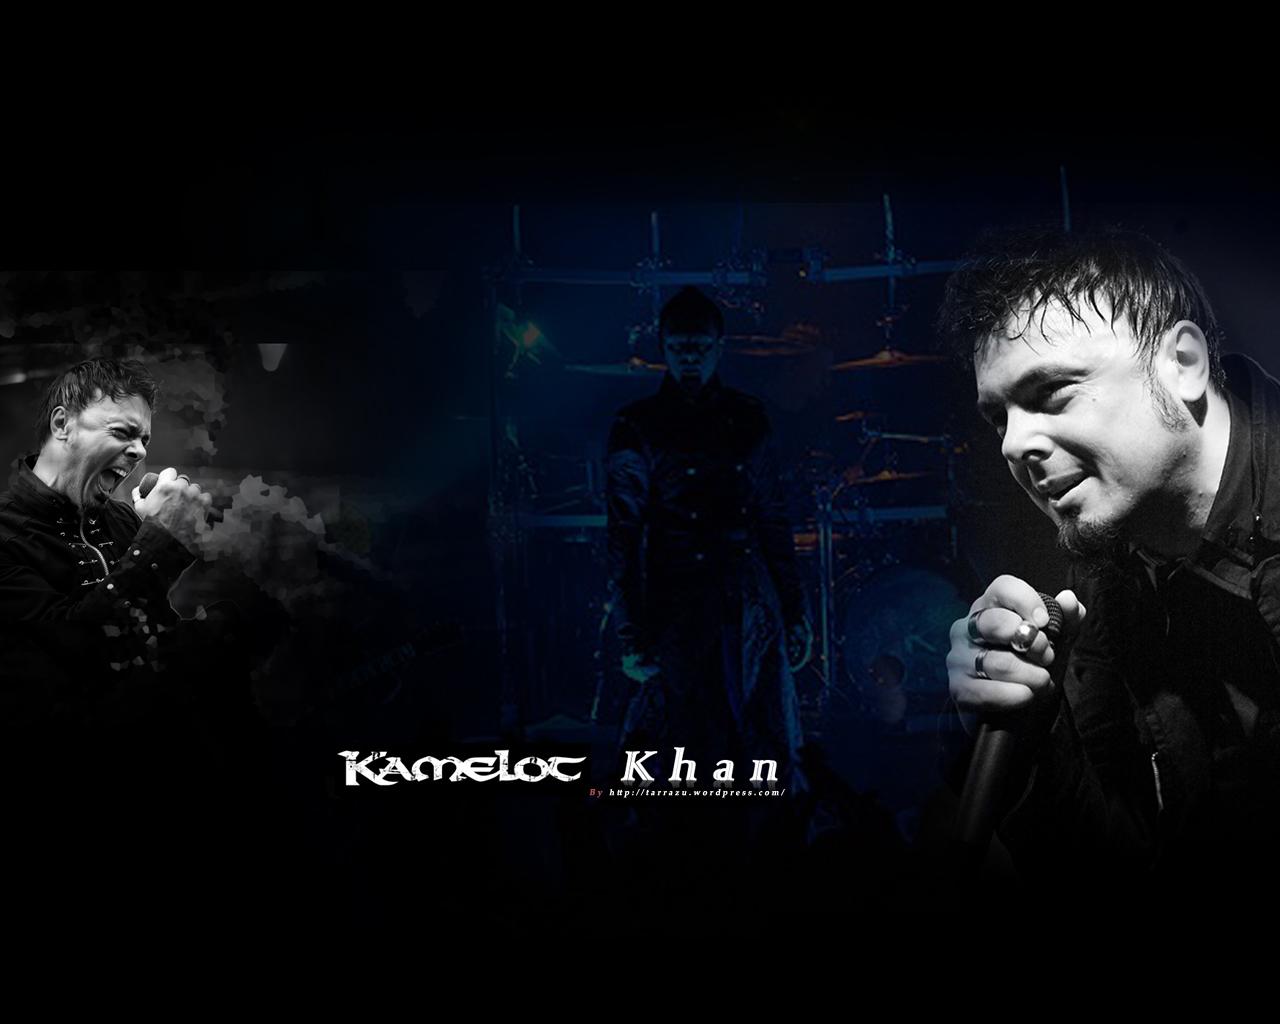 http://2.bp.blogspot.com/_eq95IQh1SKo/THdnWj9Gk3I/AAAAAAAABBs/2EXP1SLN3D8/s1600/khan_wallpaper_poetry_1280x_by_lestat546.jpg